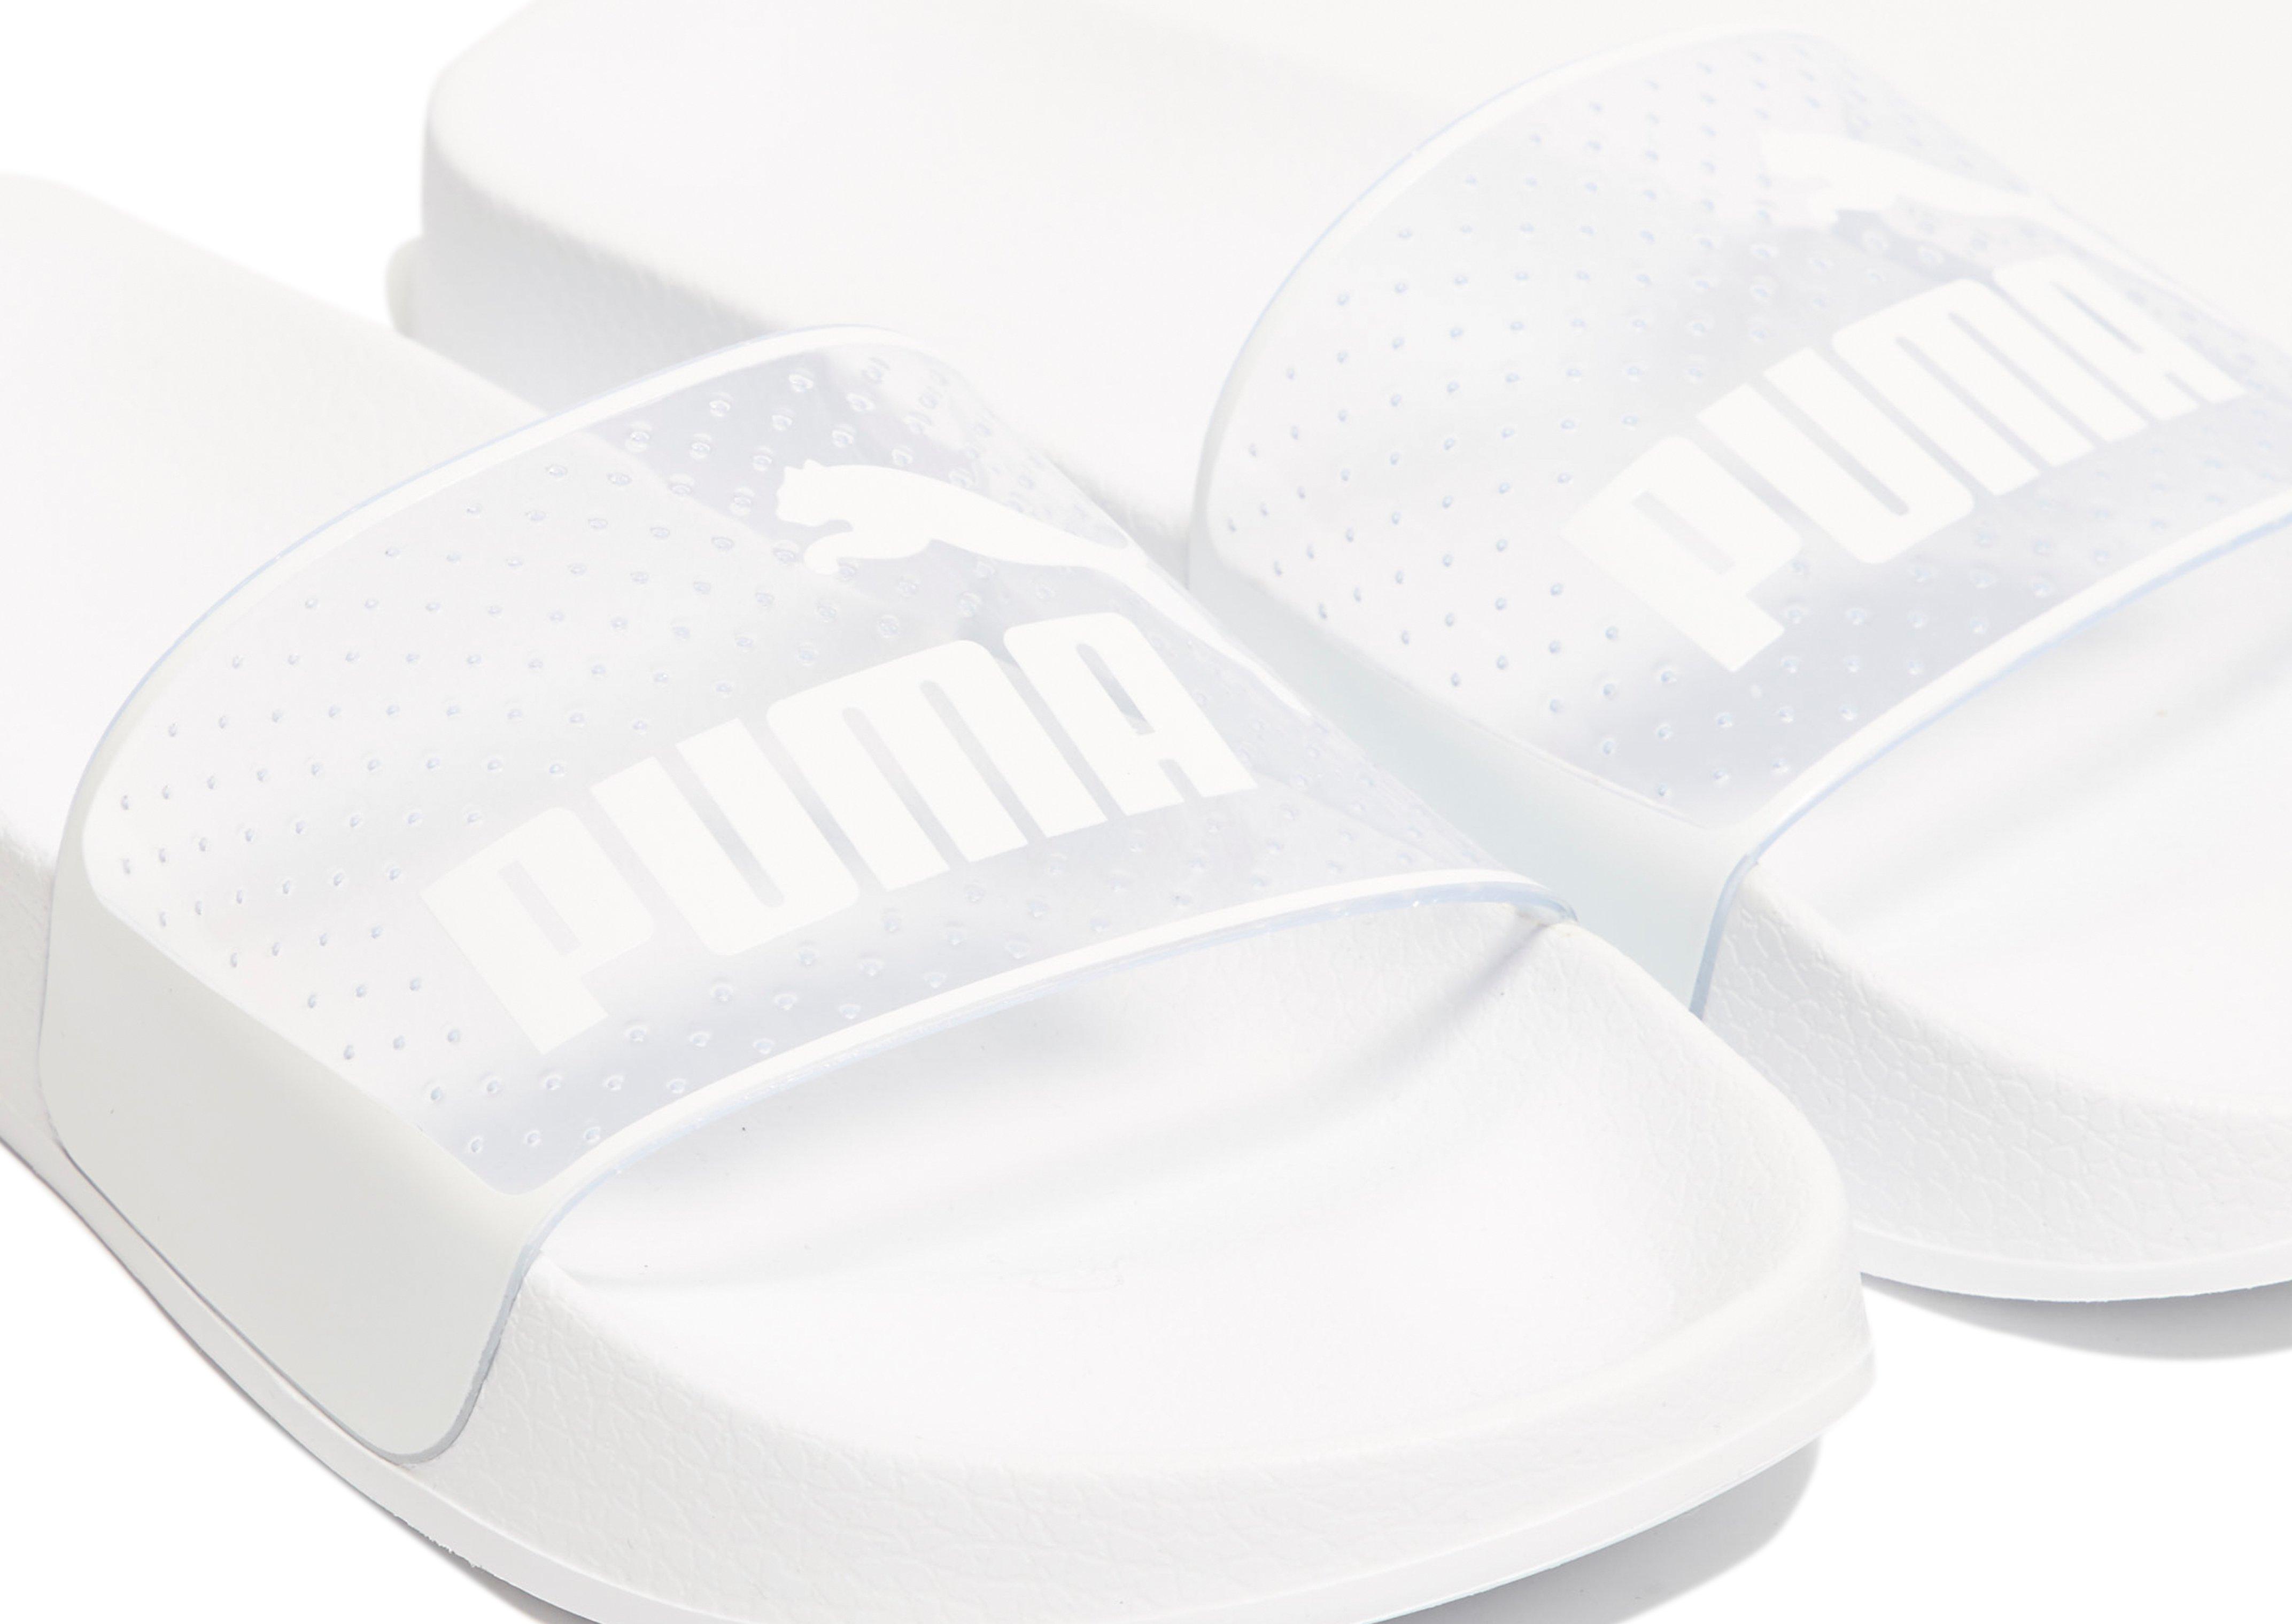 Lyst - PUMA Leadcat Jelly Slides in White 87b1325c8